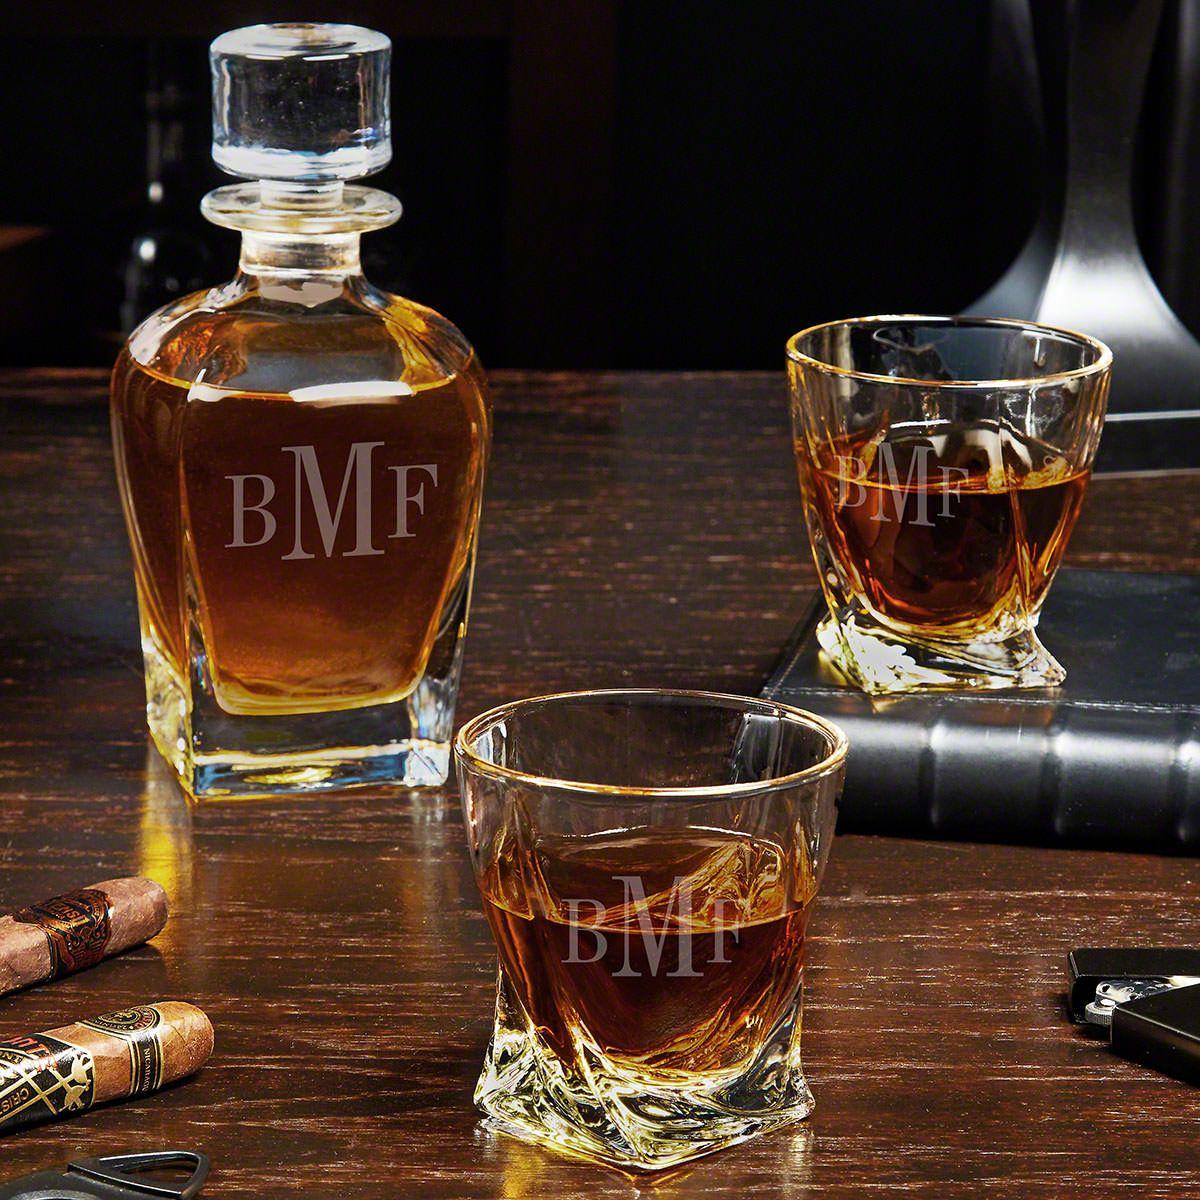 Classic Monogram Engraved Draper Whiskey Decanter Set